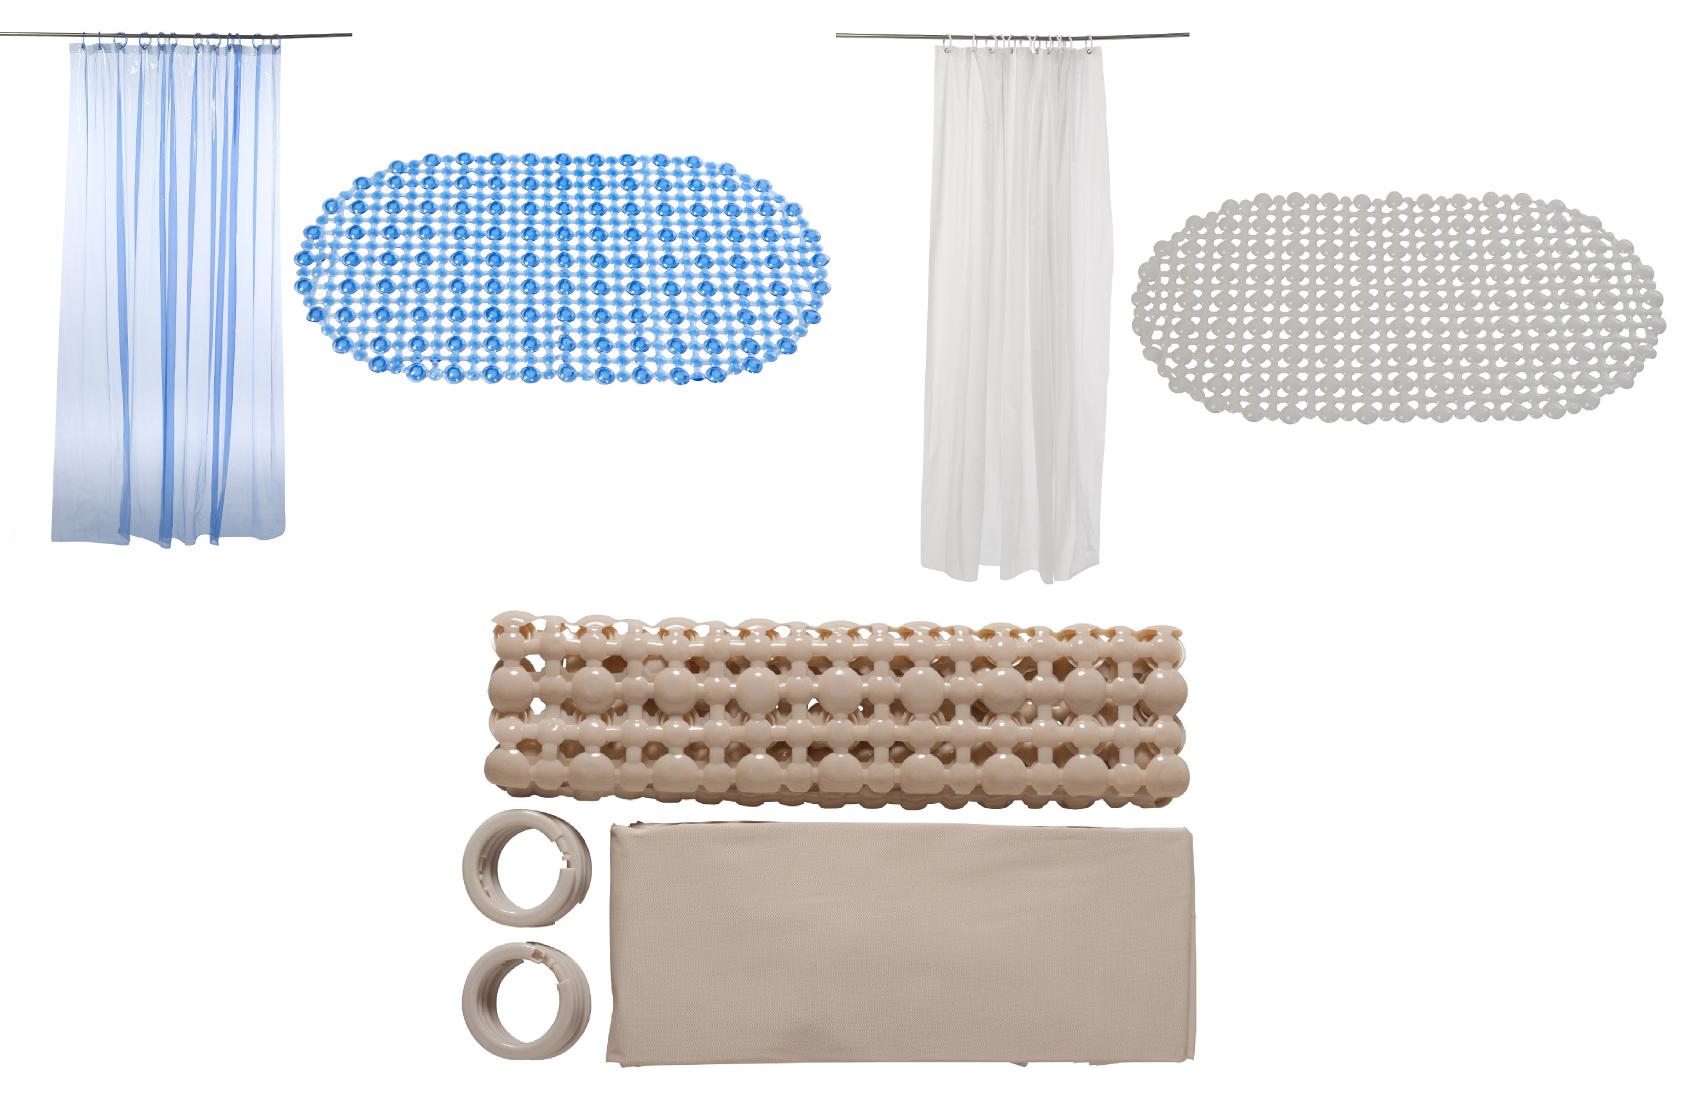 100% Vinyl Bath Mat & Shower Curtain with 12 Hooks Wipe Clean Hotel ...